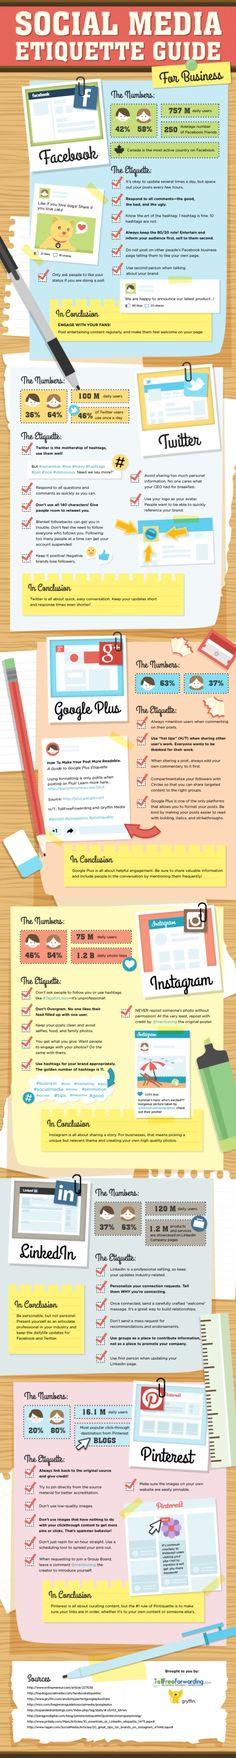 #SocialMedia #Etiquette Guide for Business